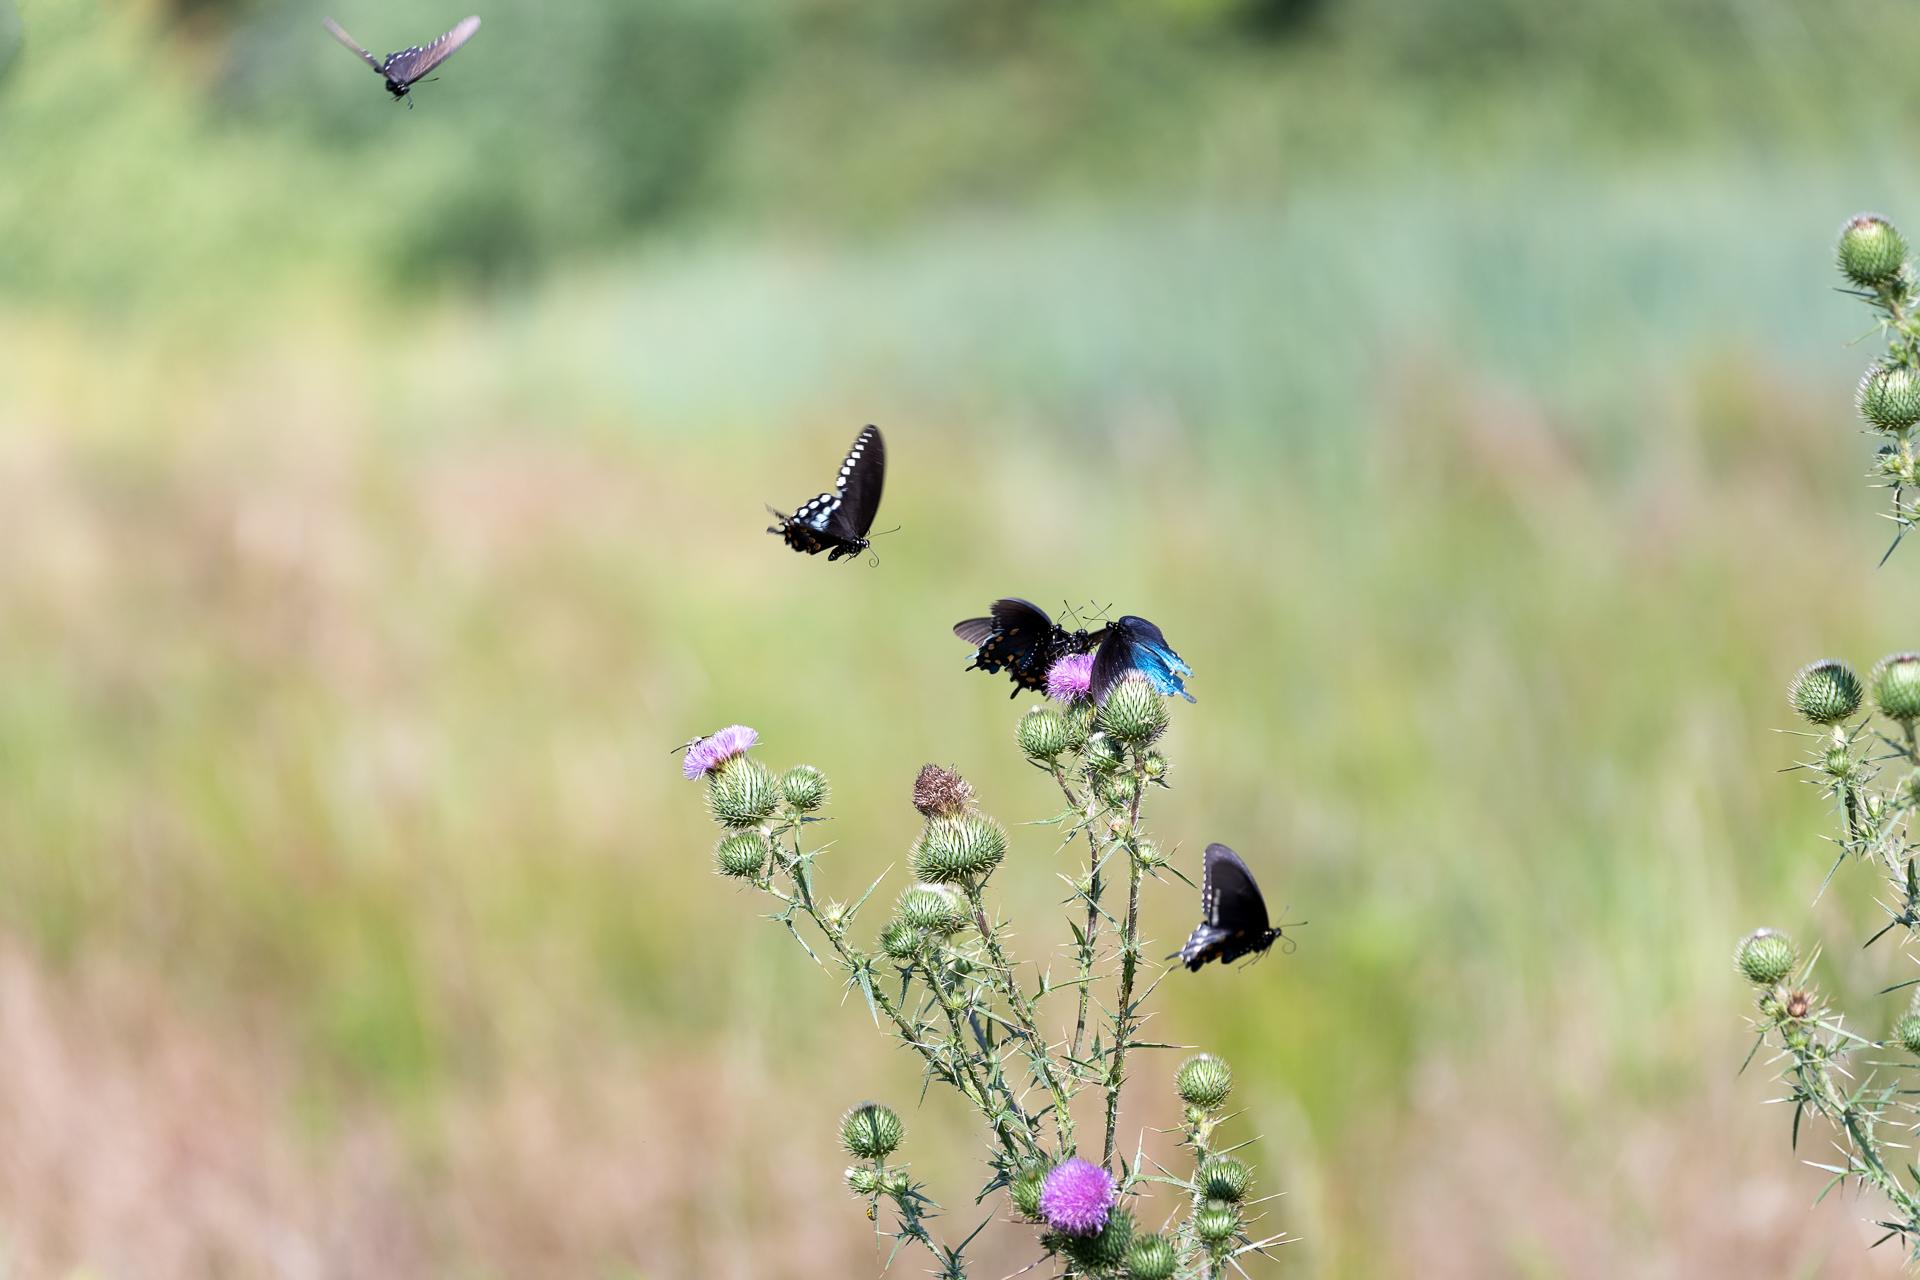 Butterflies-nature-Kathleen-Kathy-Roberts-Asheville-NC-Photographer-6.jpg